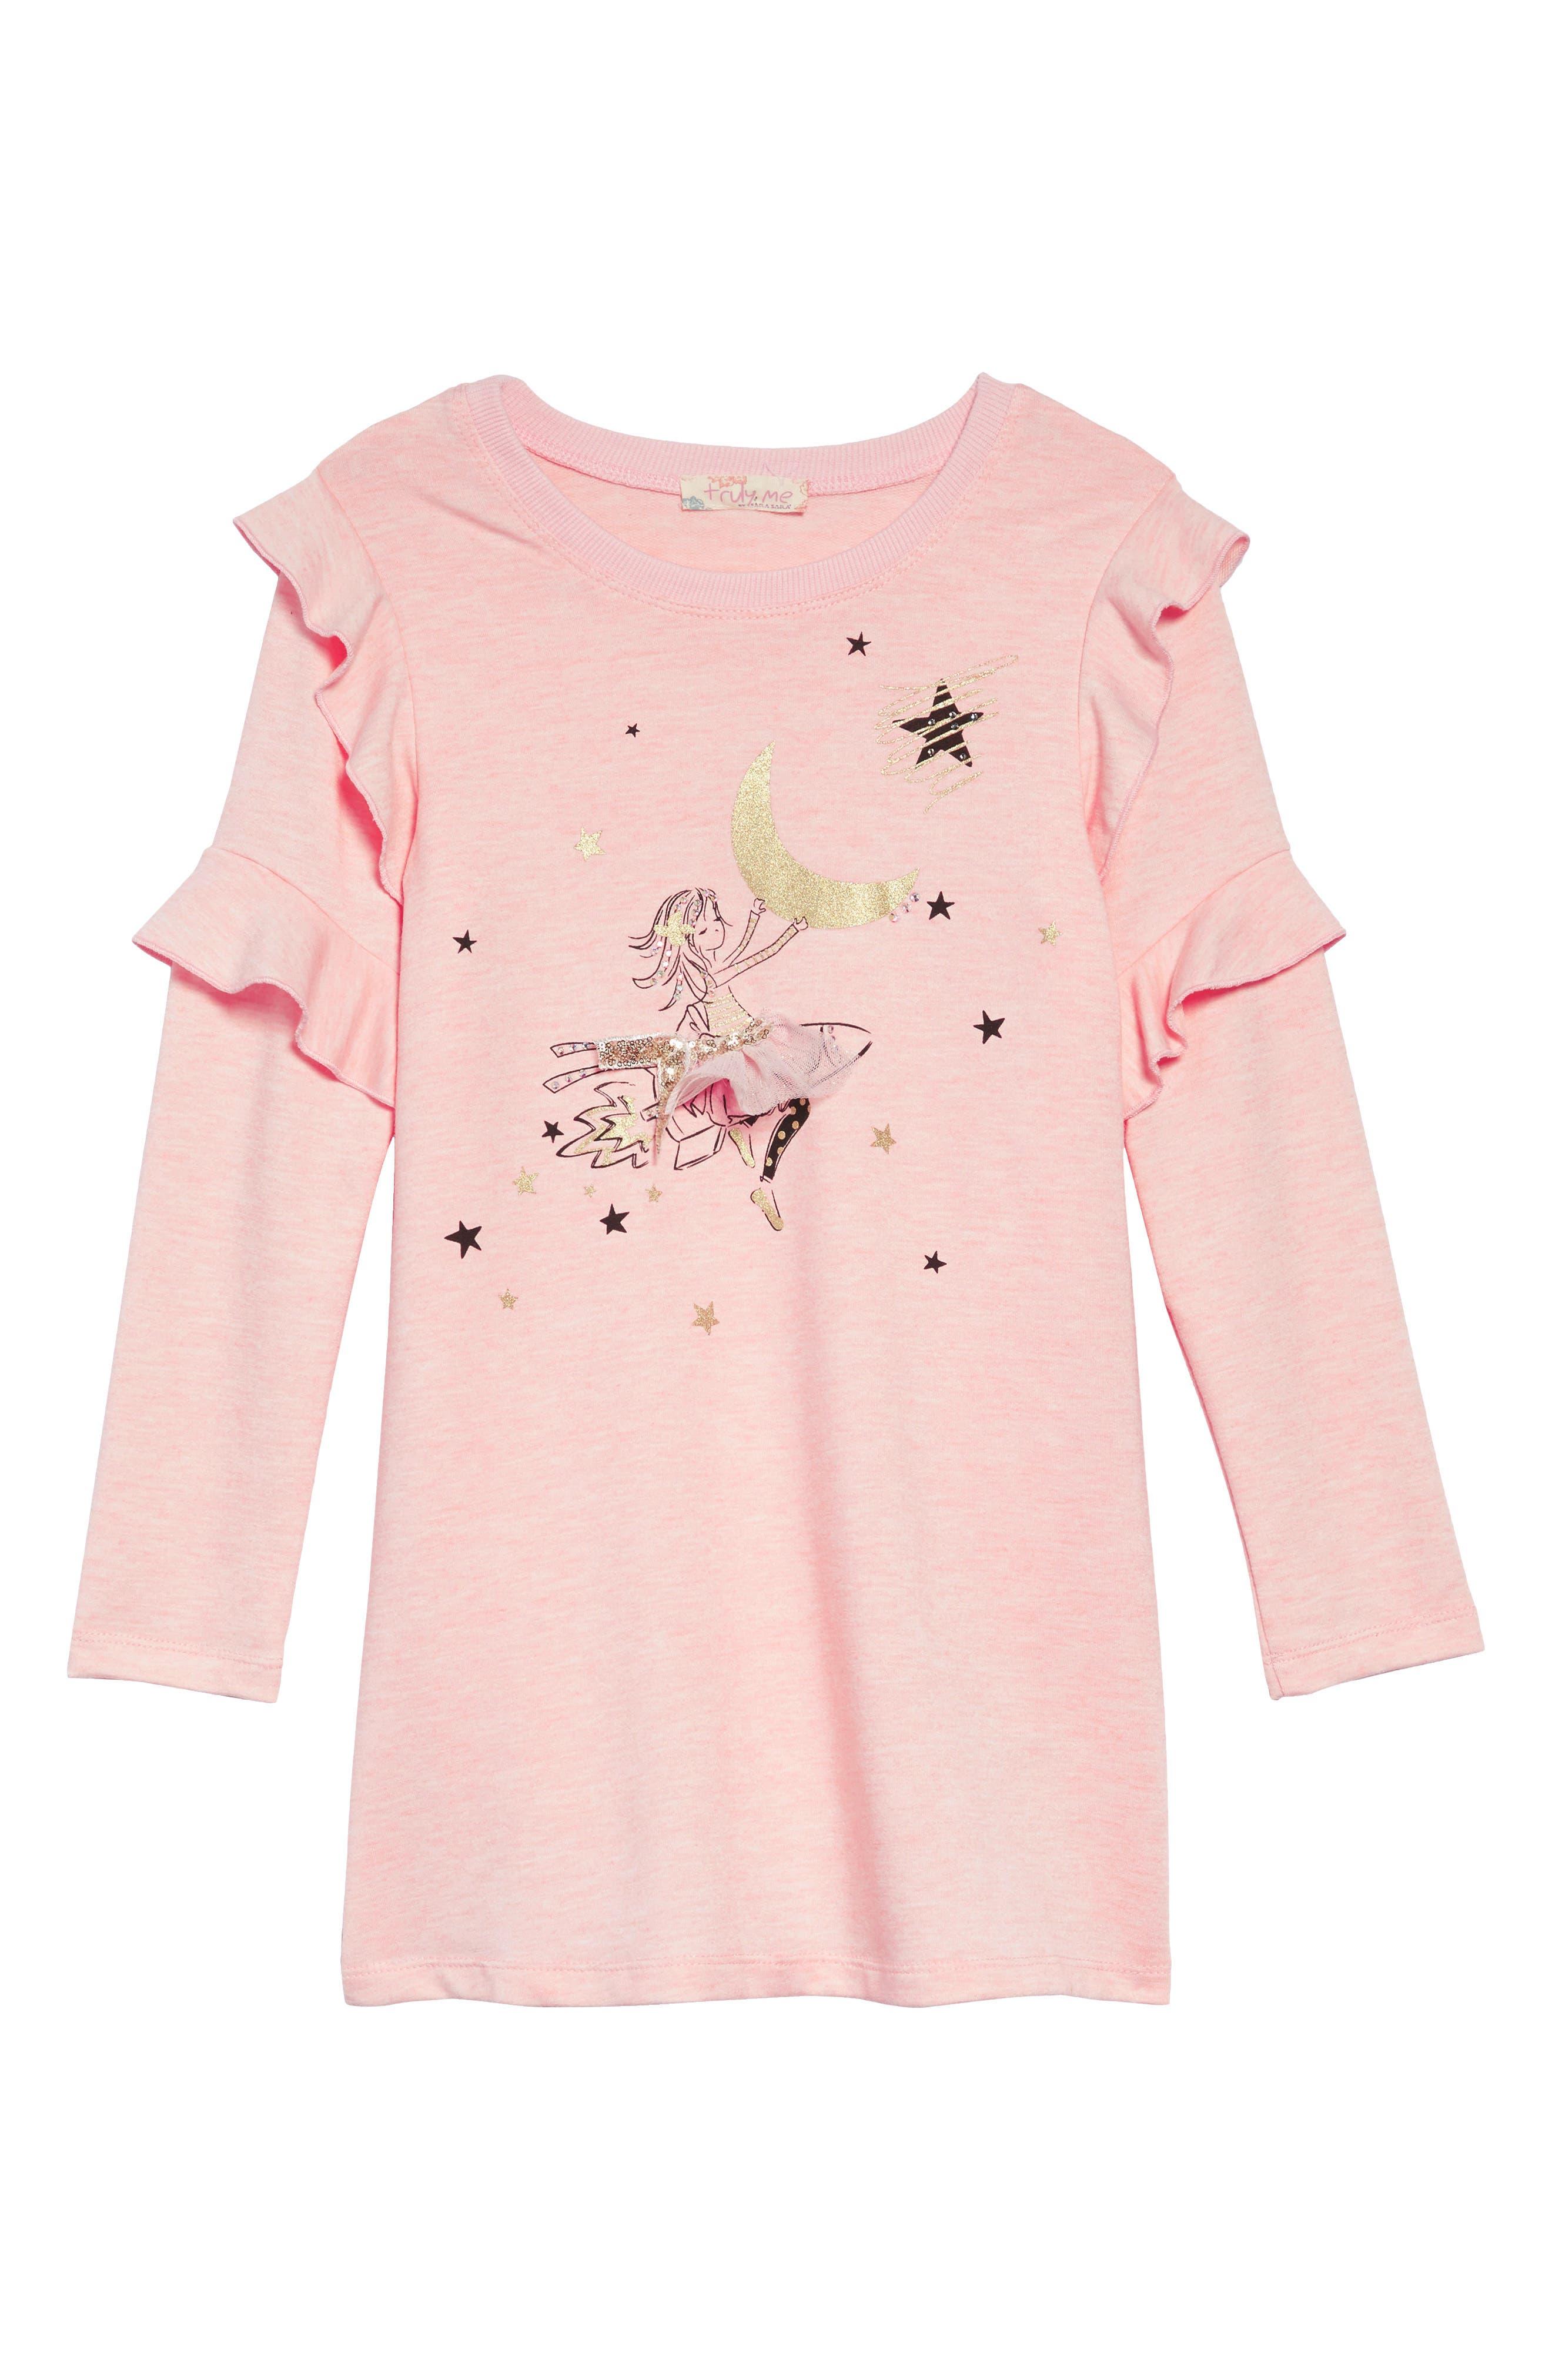 Rocket Girl A-Line Dress,                             Main thumbnail 1, color,                             PINK